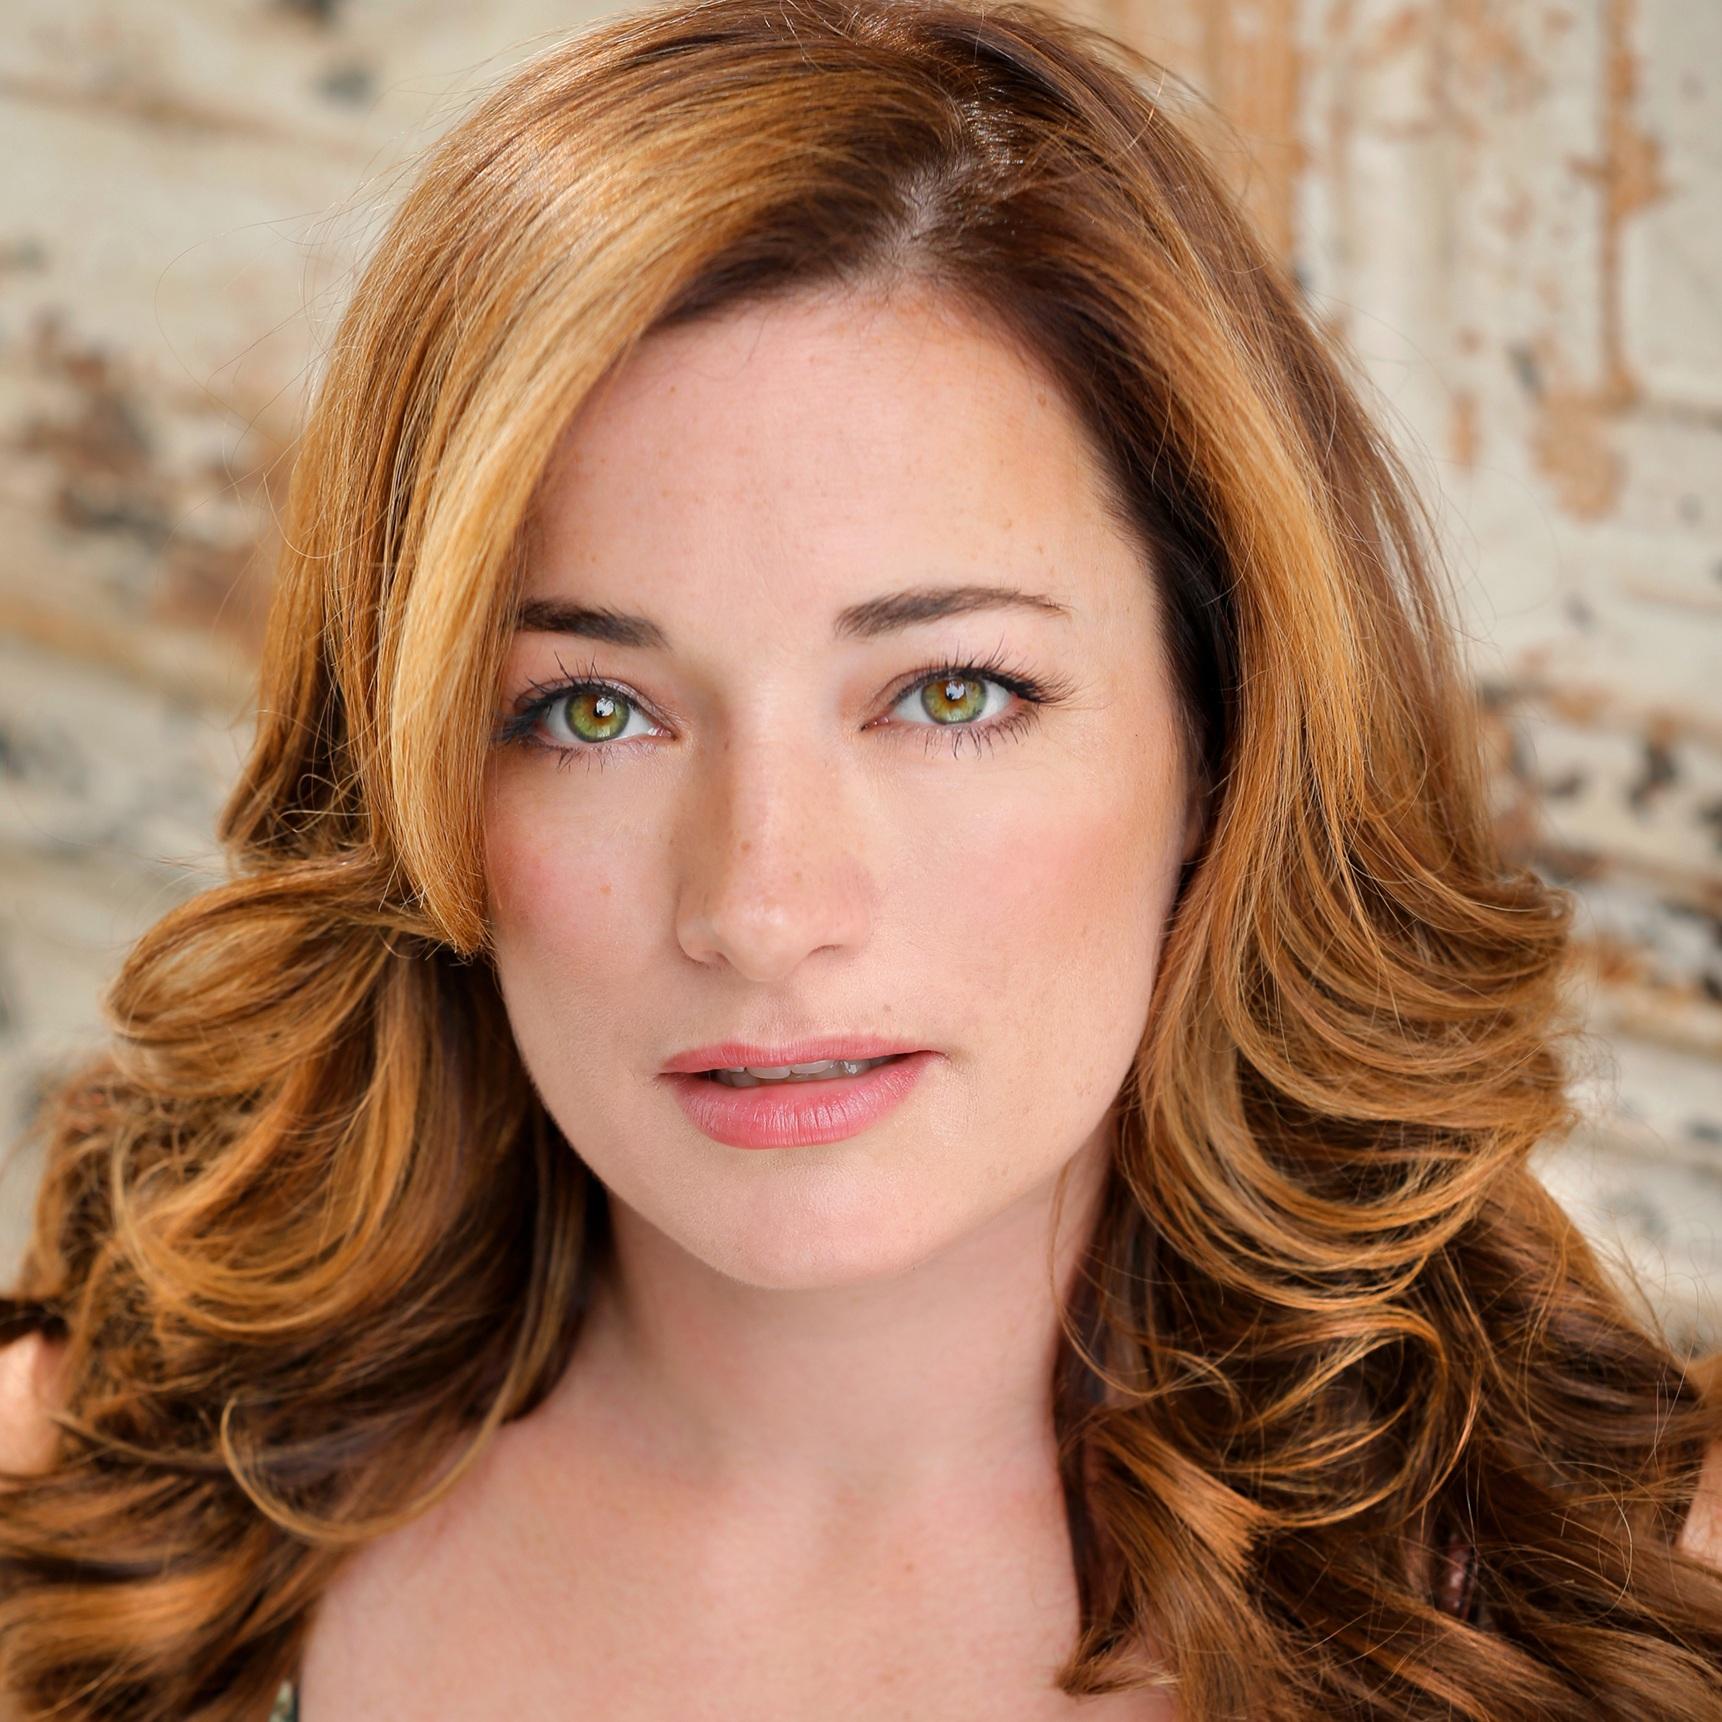 Laura Michelle Kelly my fair lady